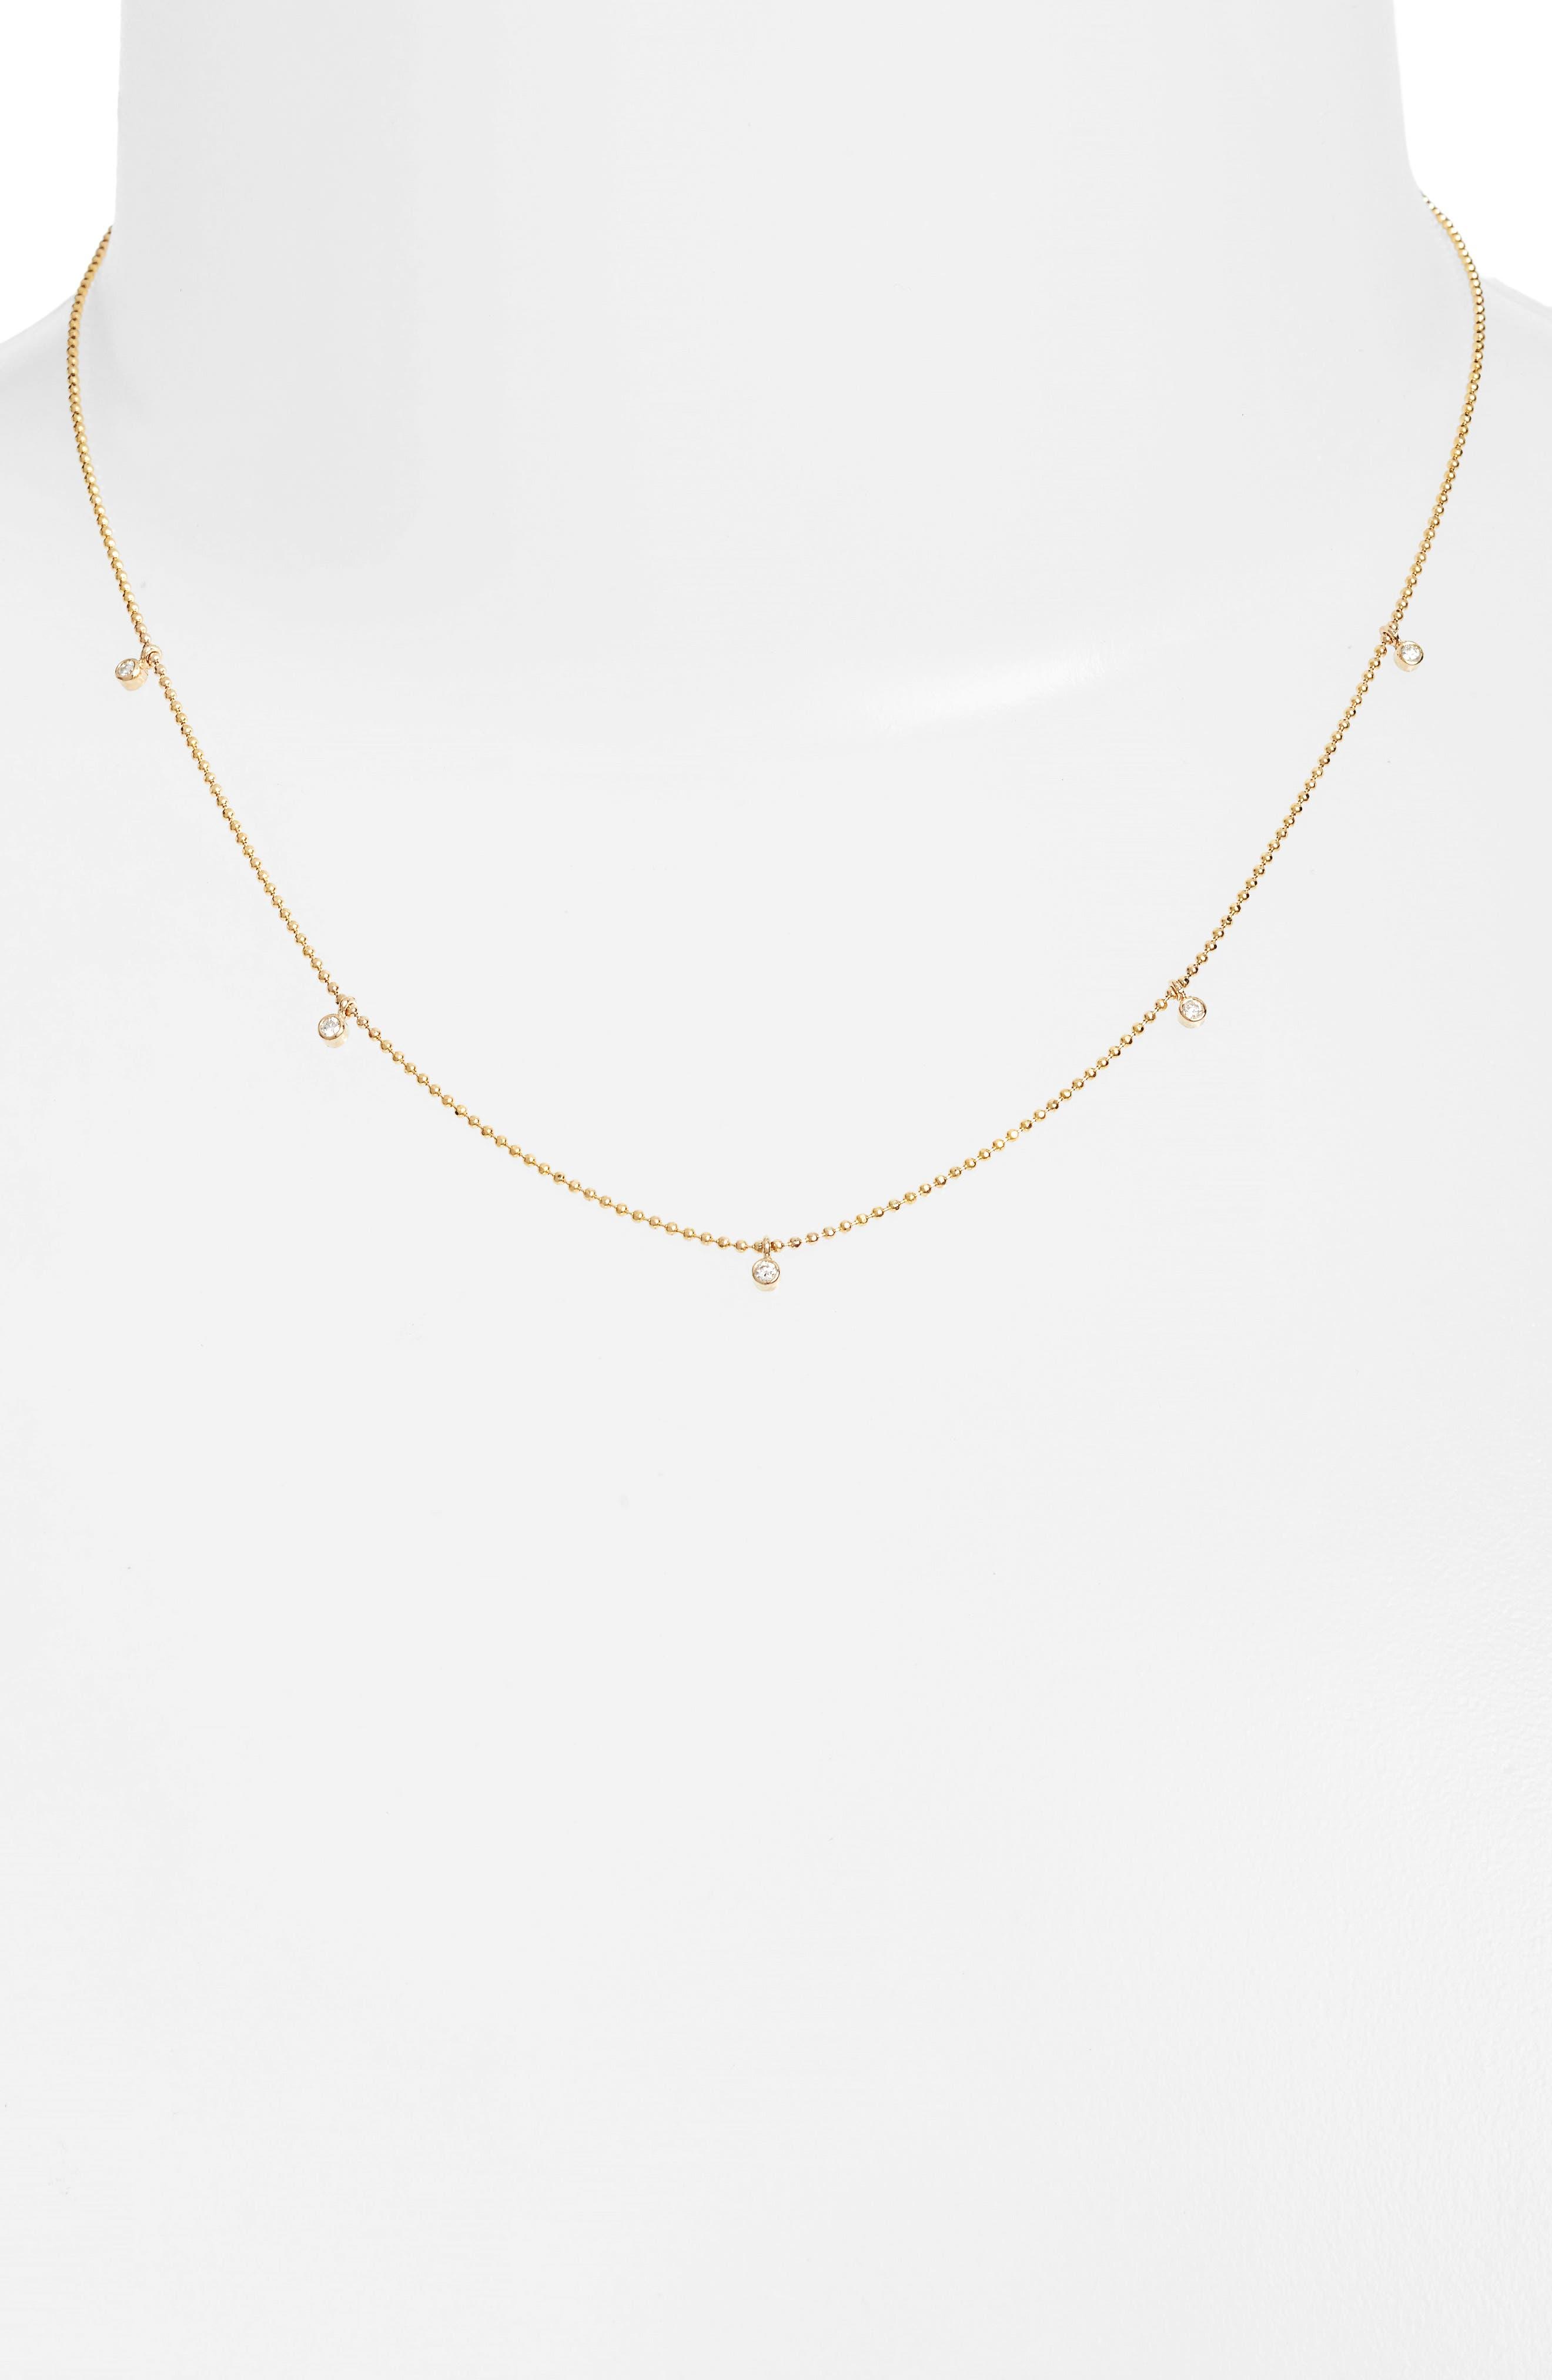 Zoë Chicco Diamond Charm Necklace (Nordstrom Exclusive)